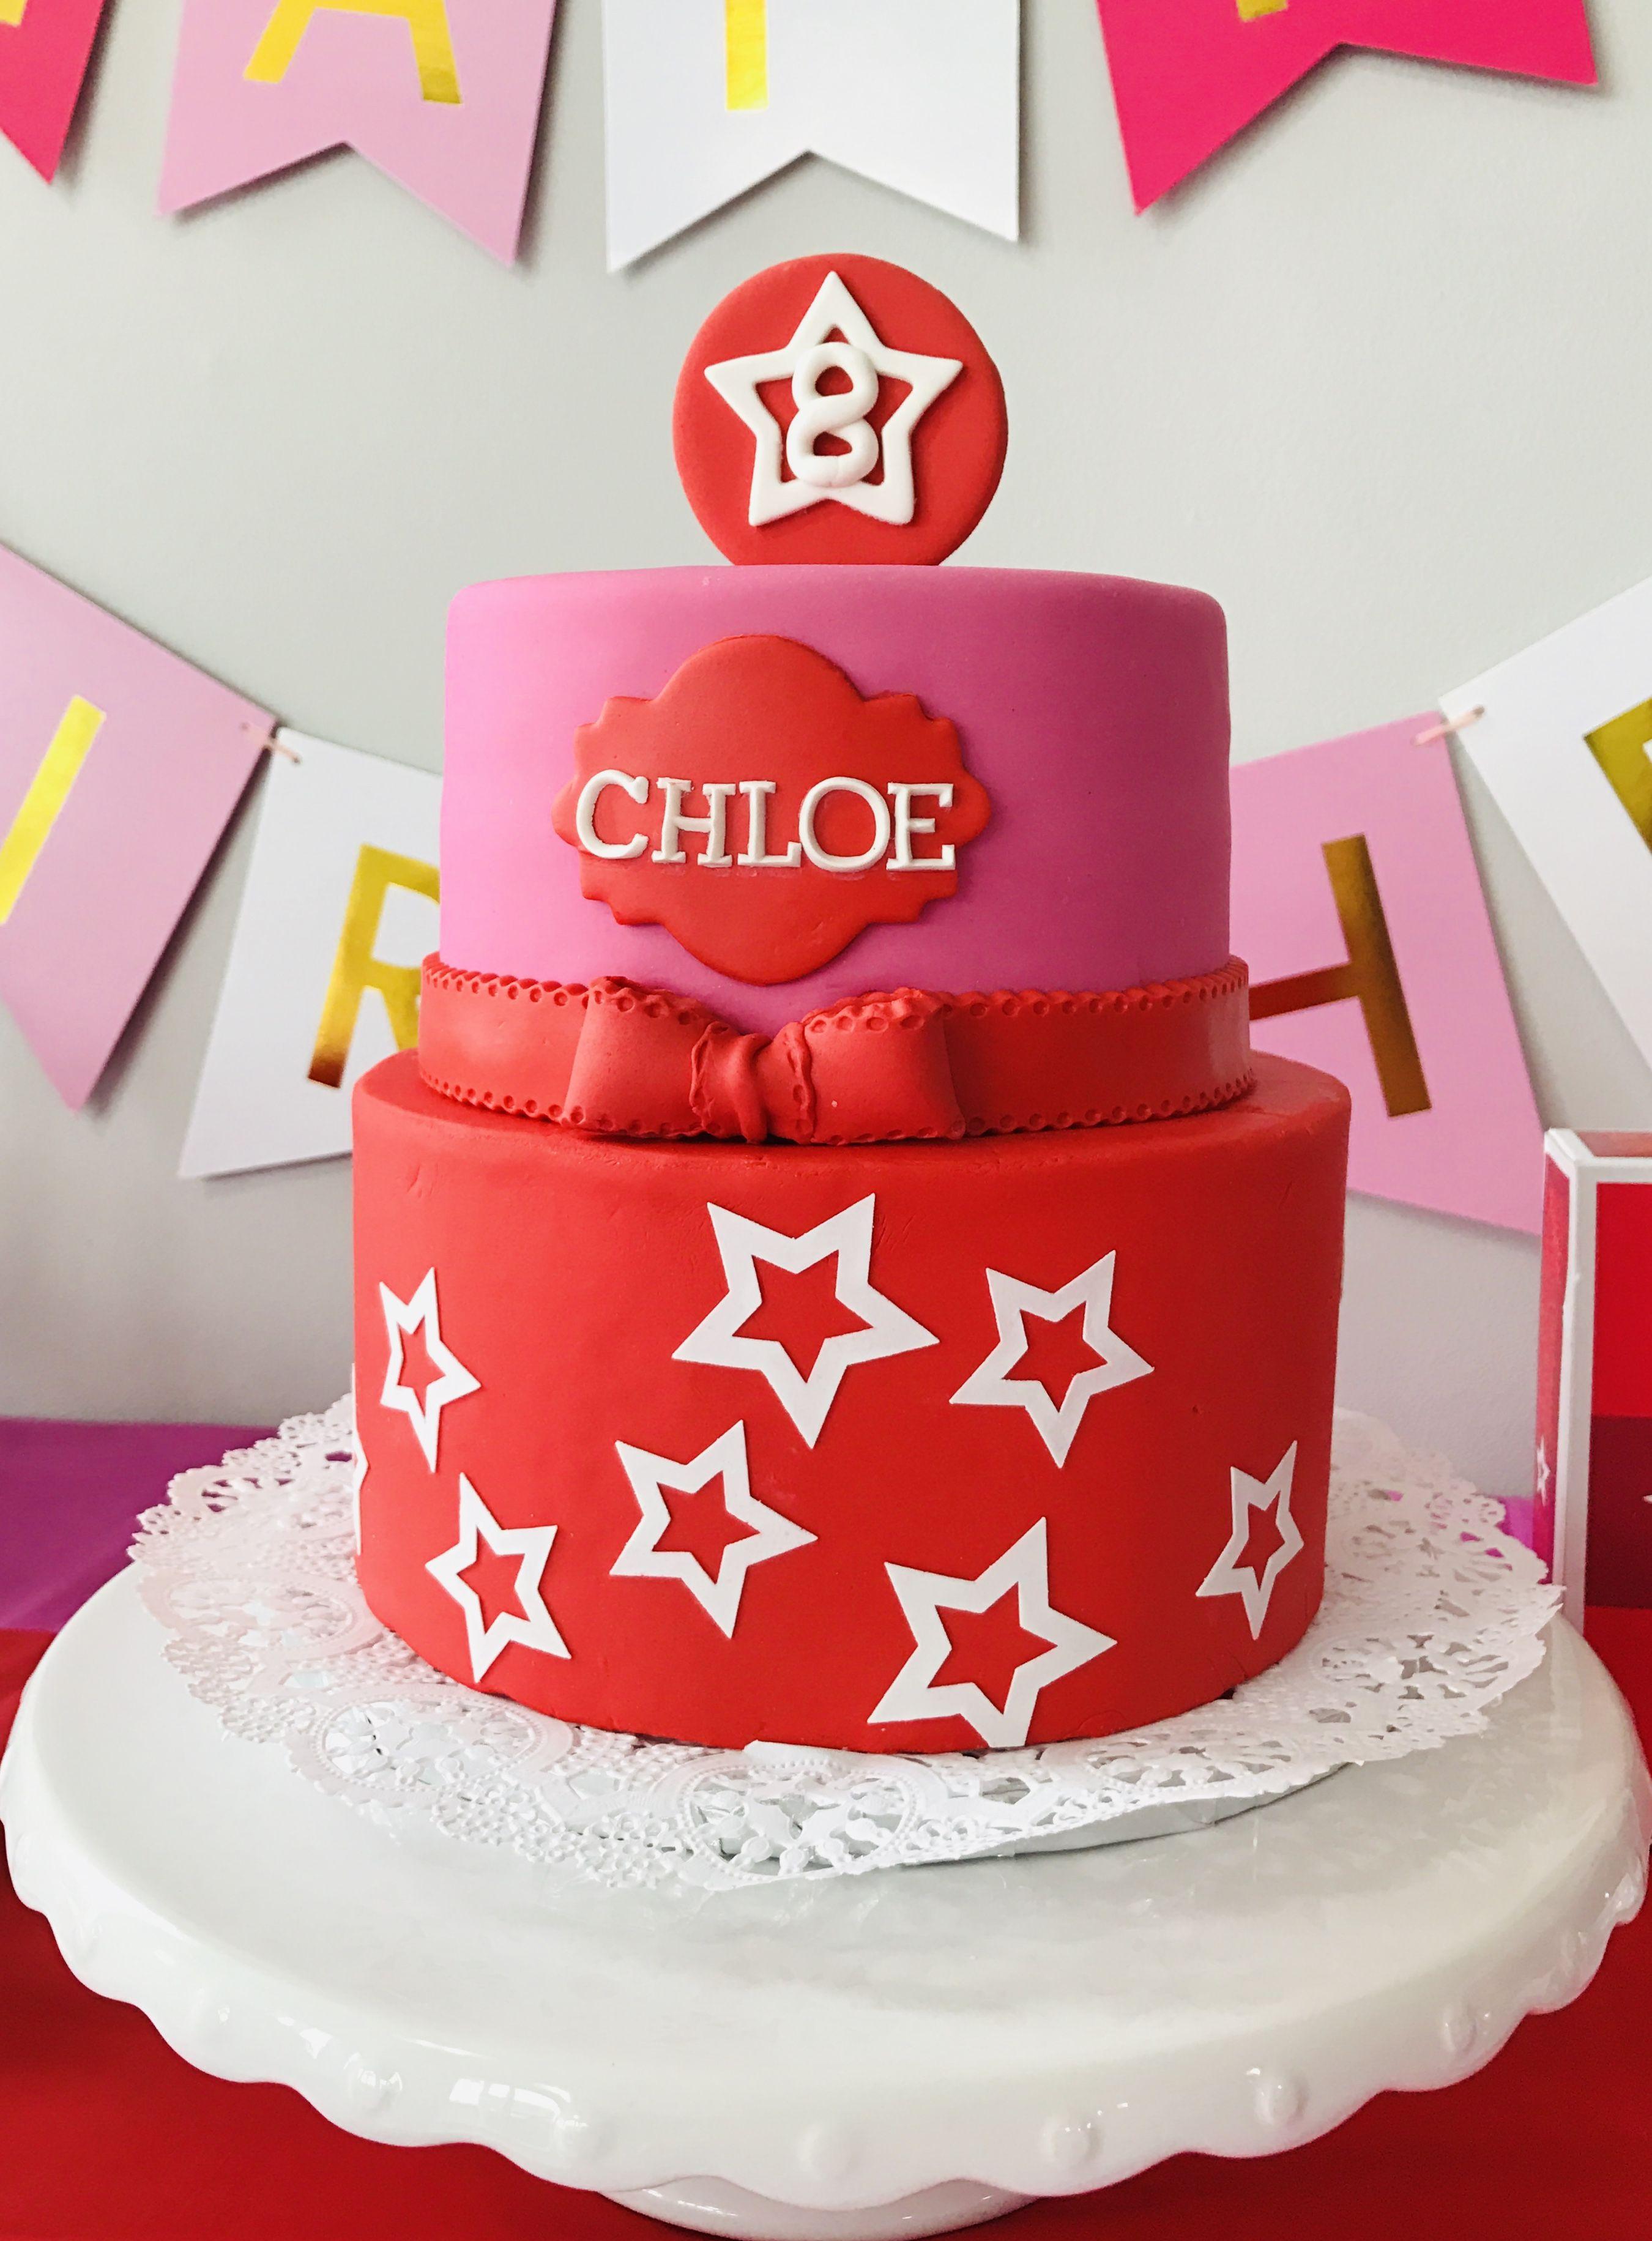 American girl cake fondant cakes american girl cakes cake